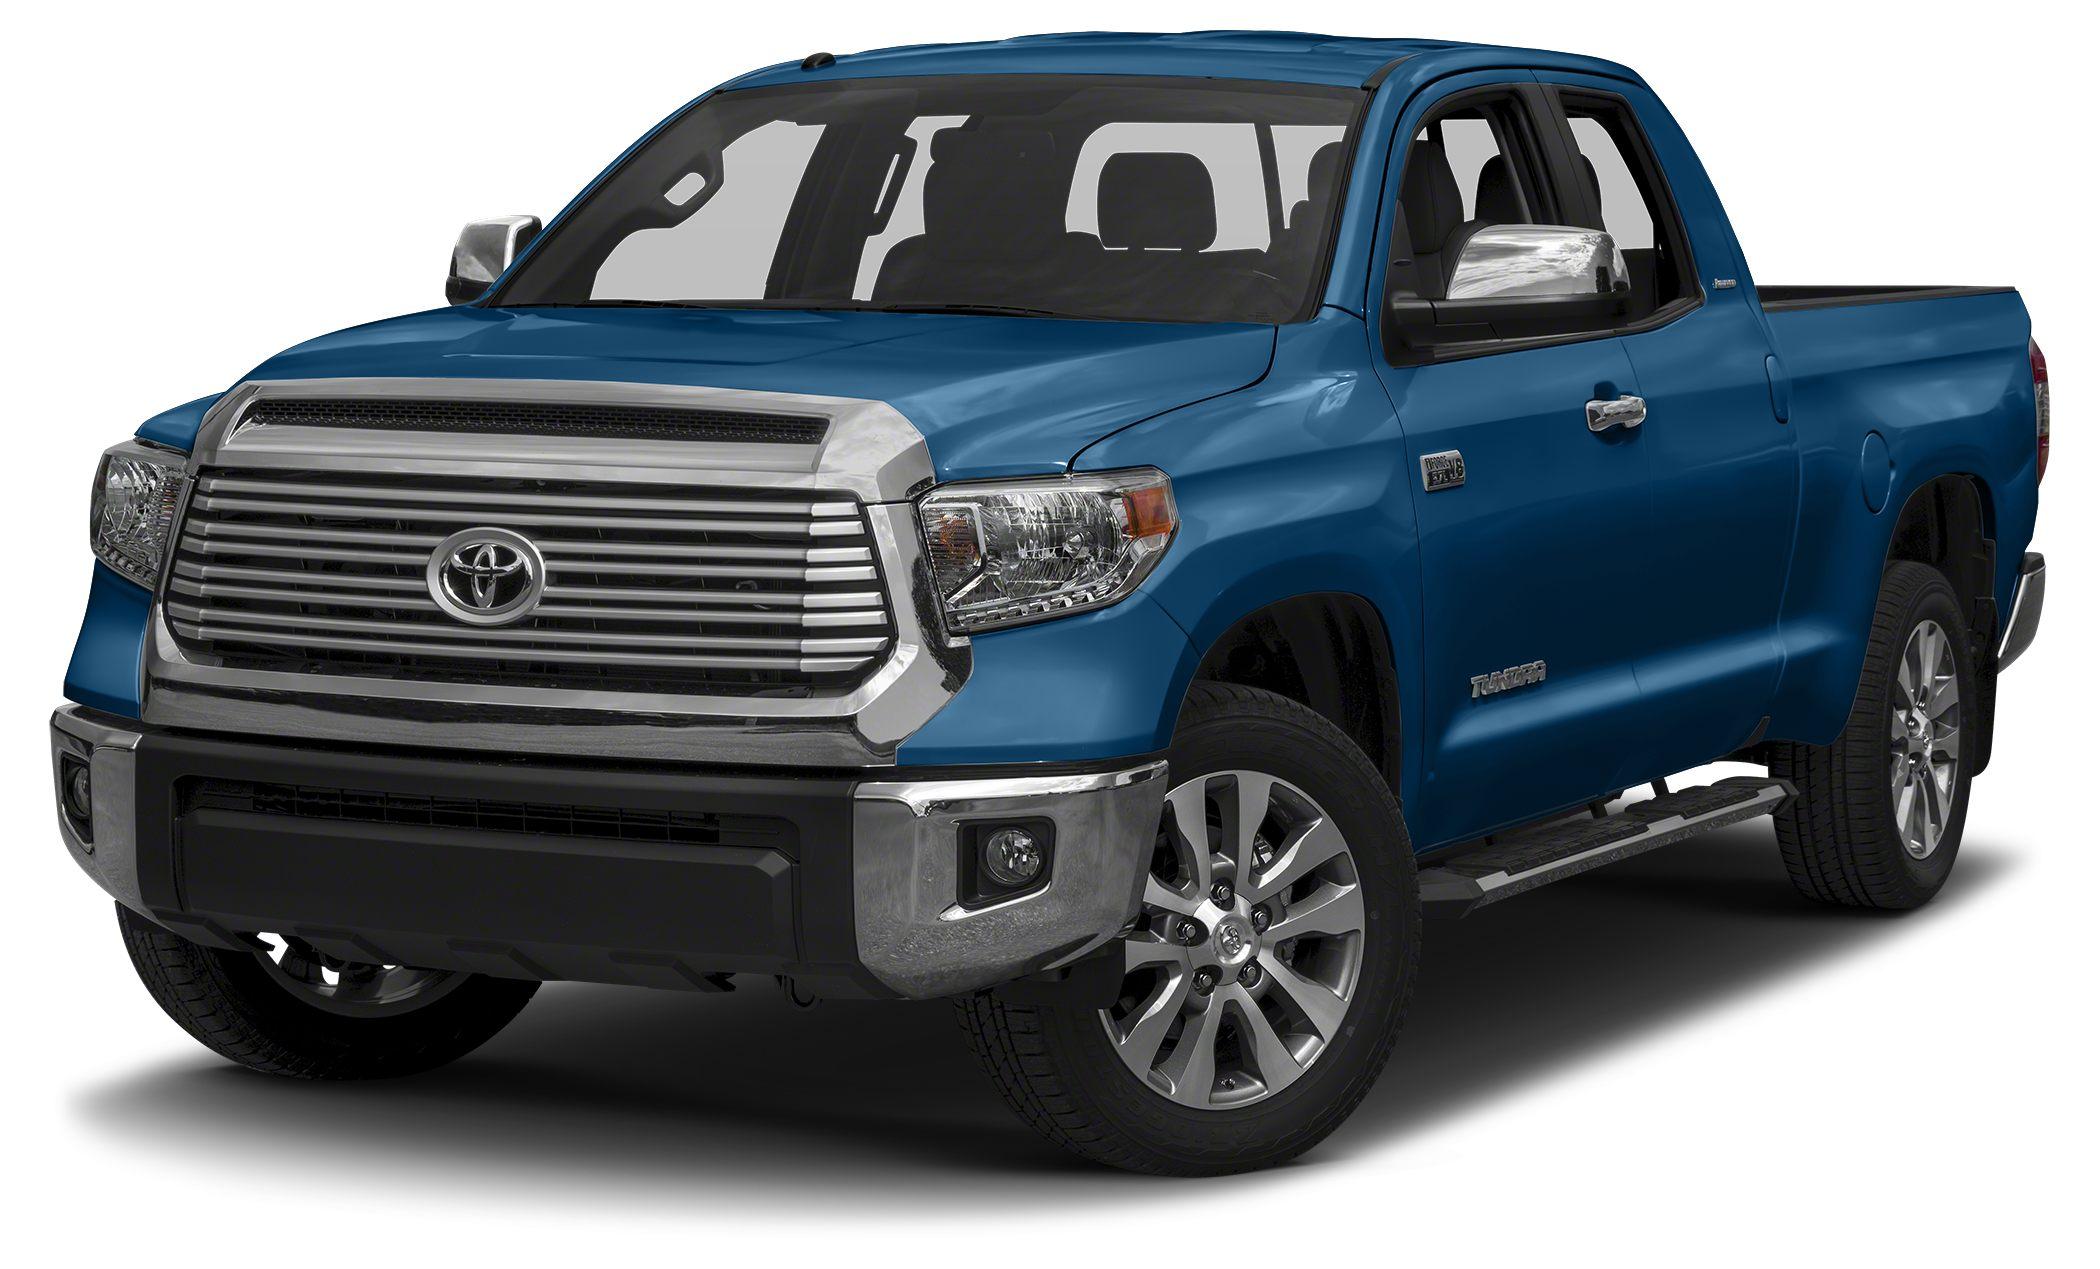 2016 Toyota Tundra Limited Navigation Heated Leather Seats Back-Up Camera Premium Sound System